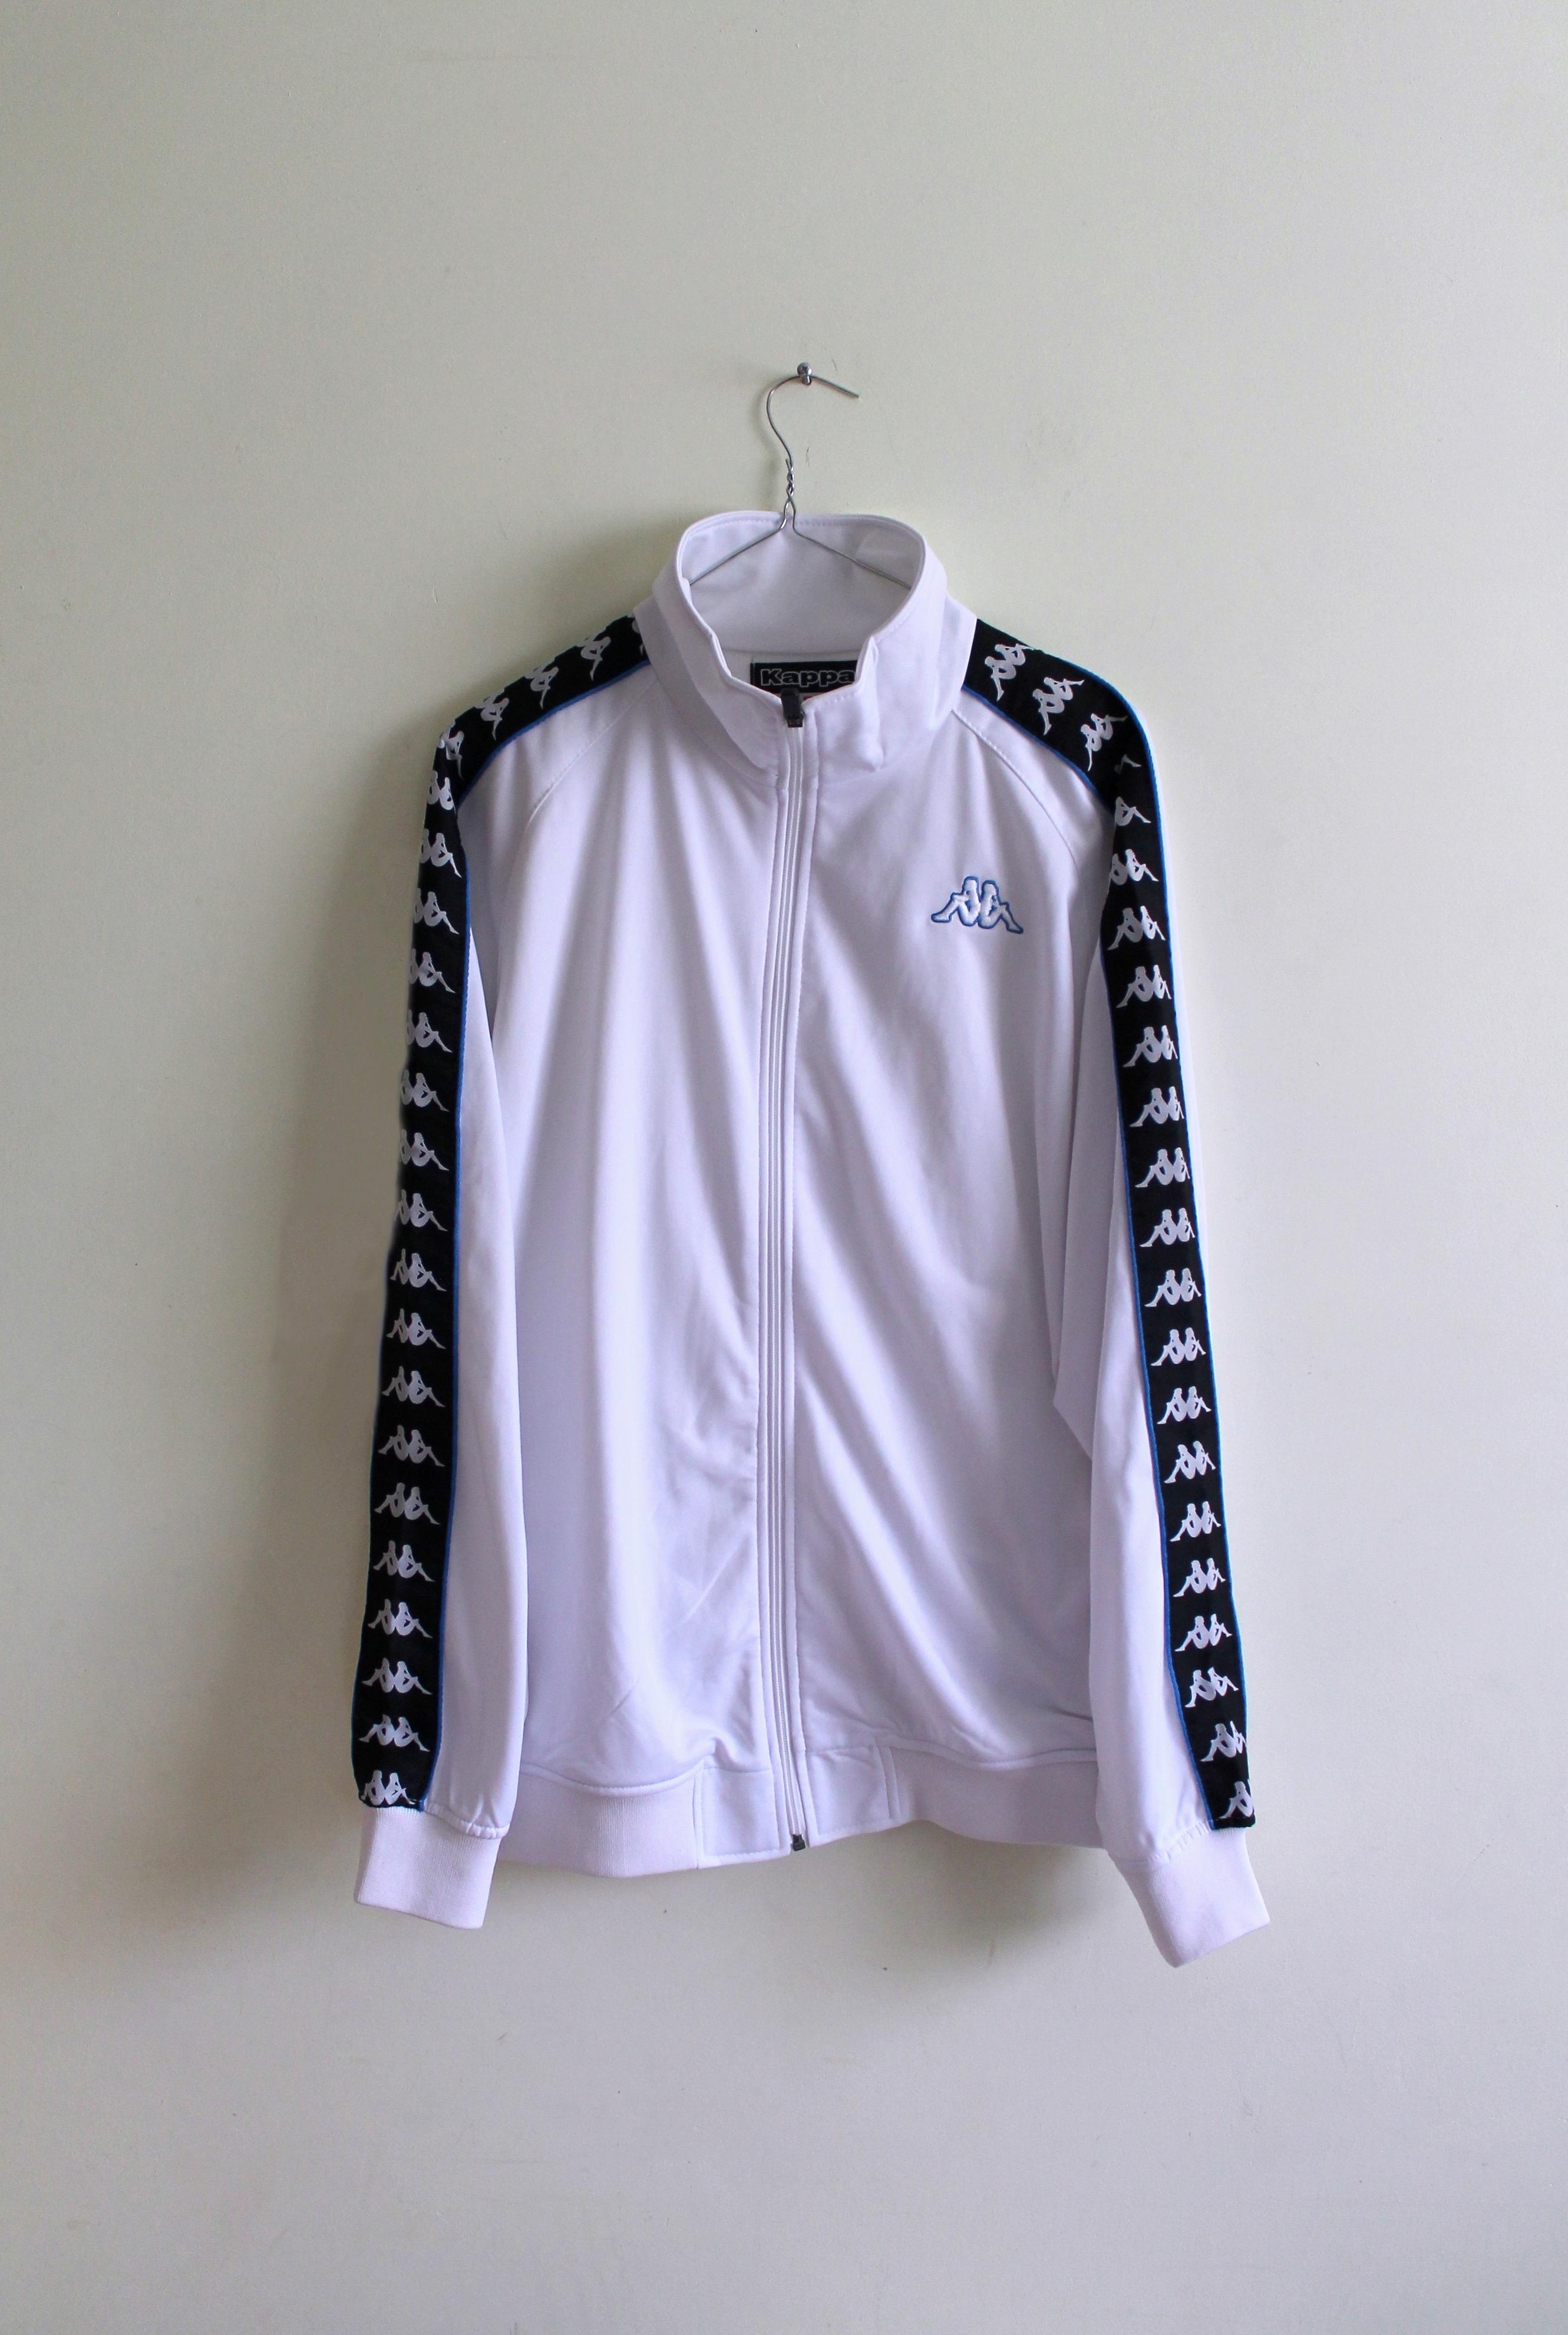 3efb774f10ac Kappa Kappa White Track Top Stussy Kappa Fred Perry Tommy Hilfiger Nike  Adidas Supreme Cav Empt Uniqlo Y-3 OFF-White Size l - Sweatshirts   Hoodies  for Sale ...